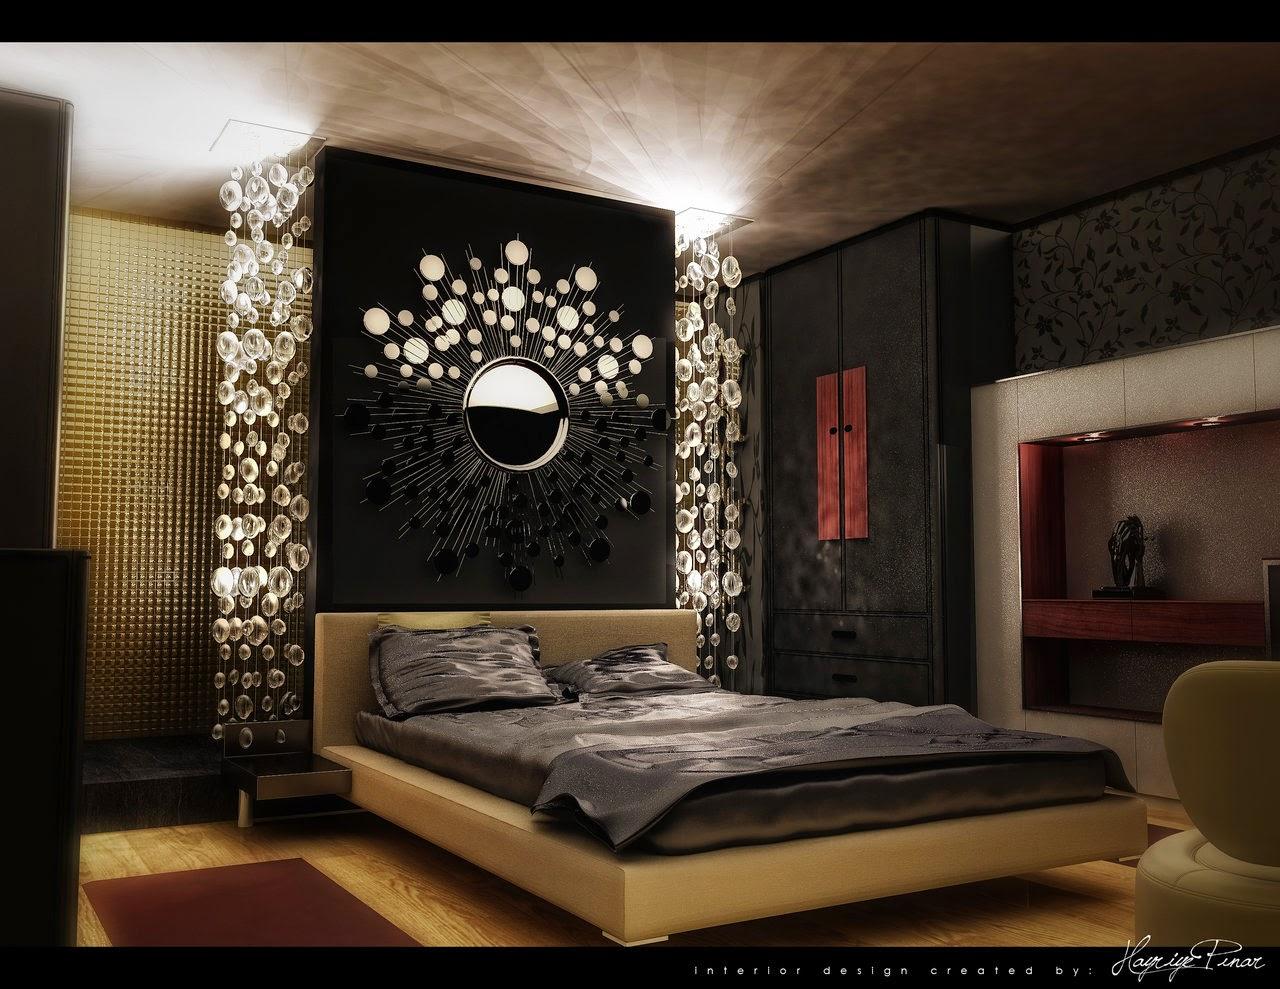 Glamorous bedroom decorating ideas